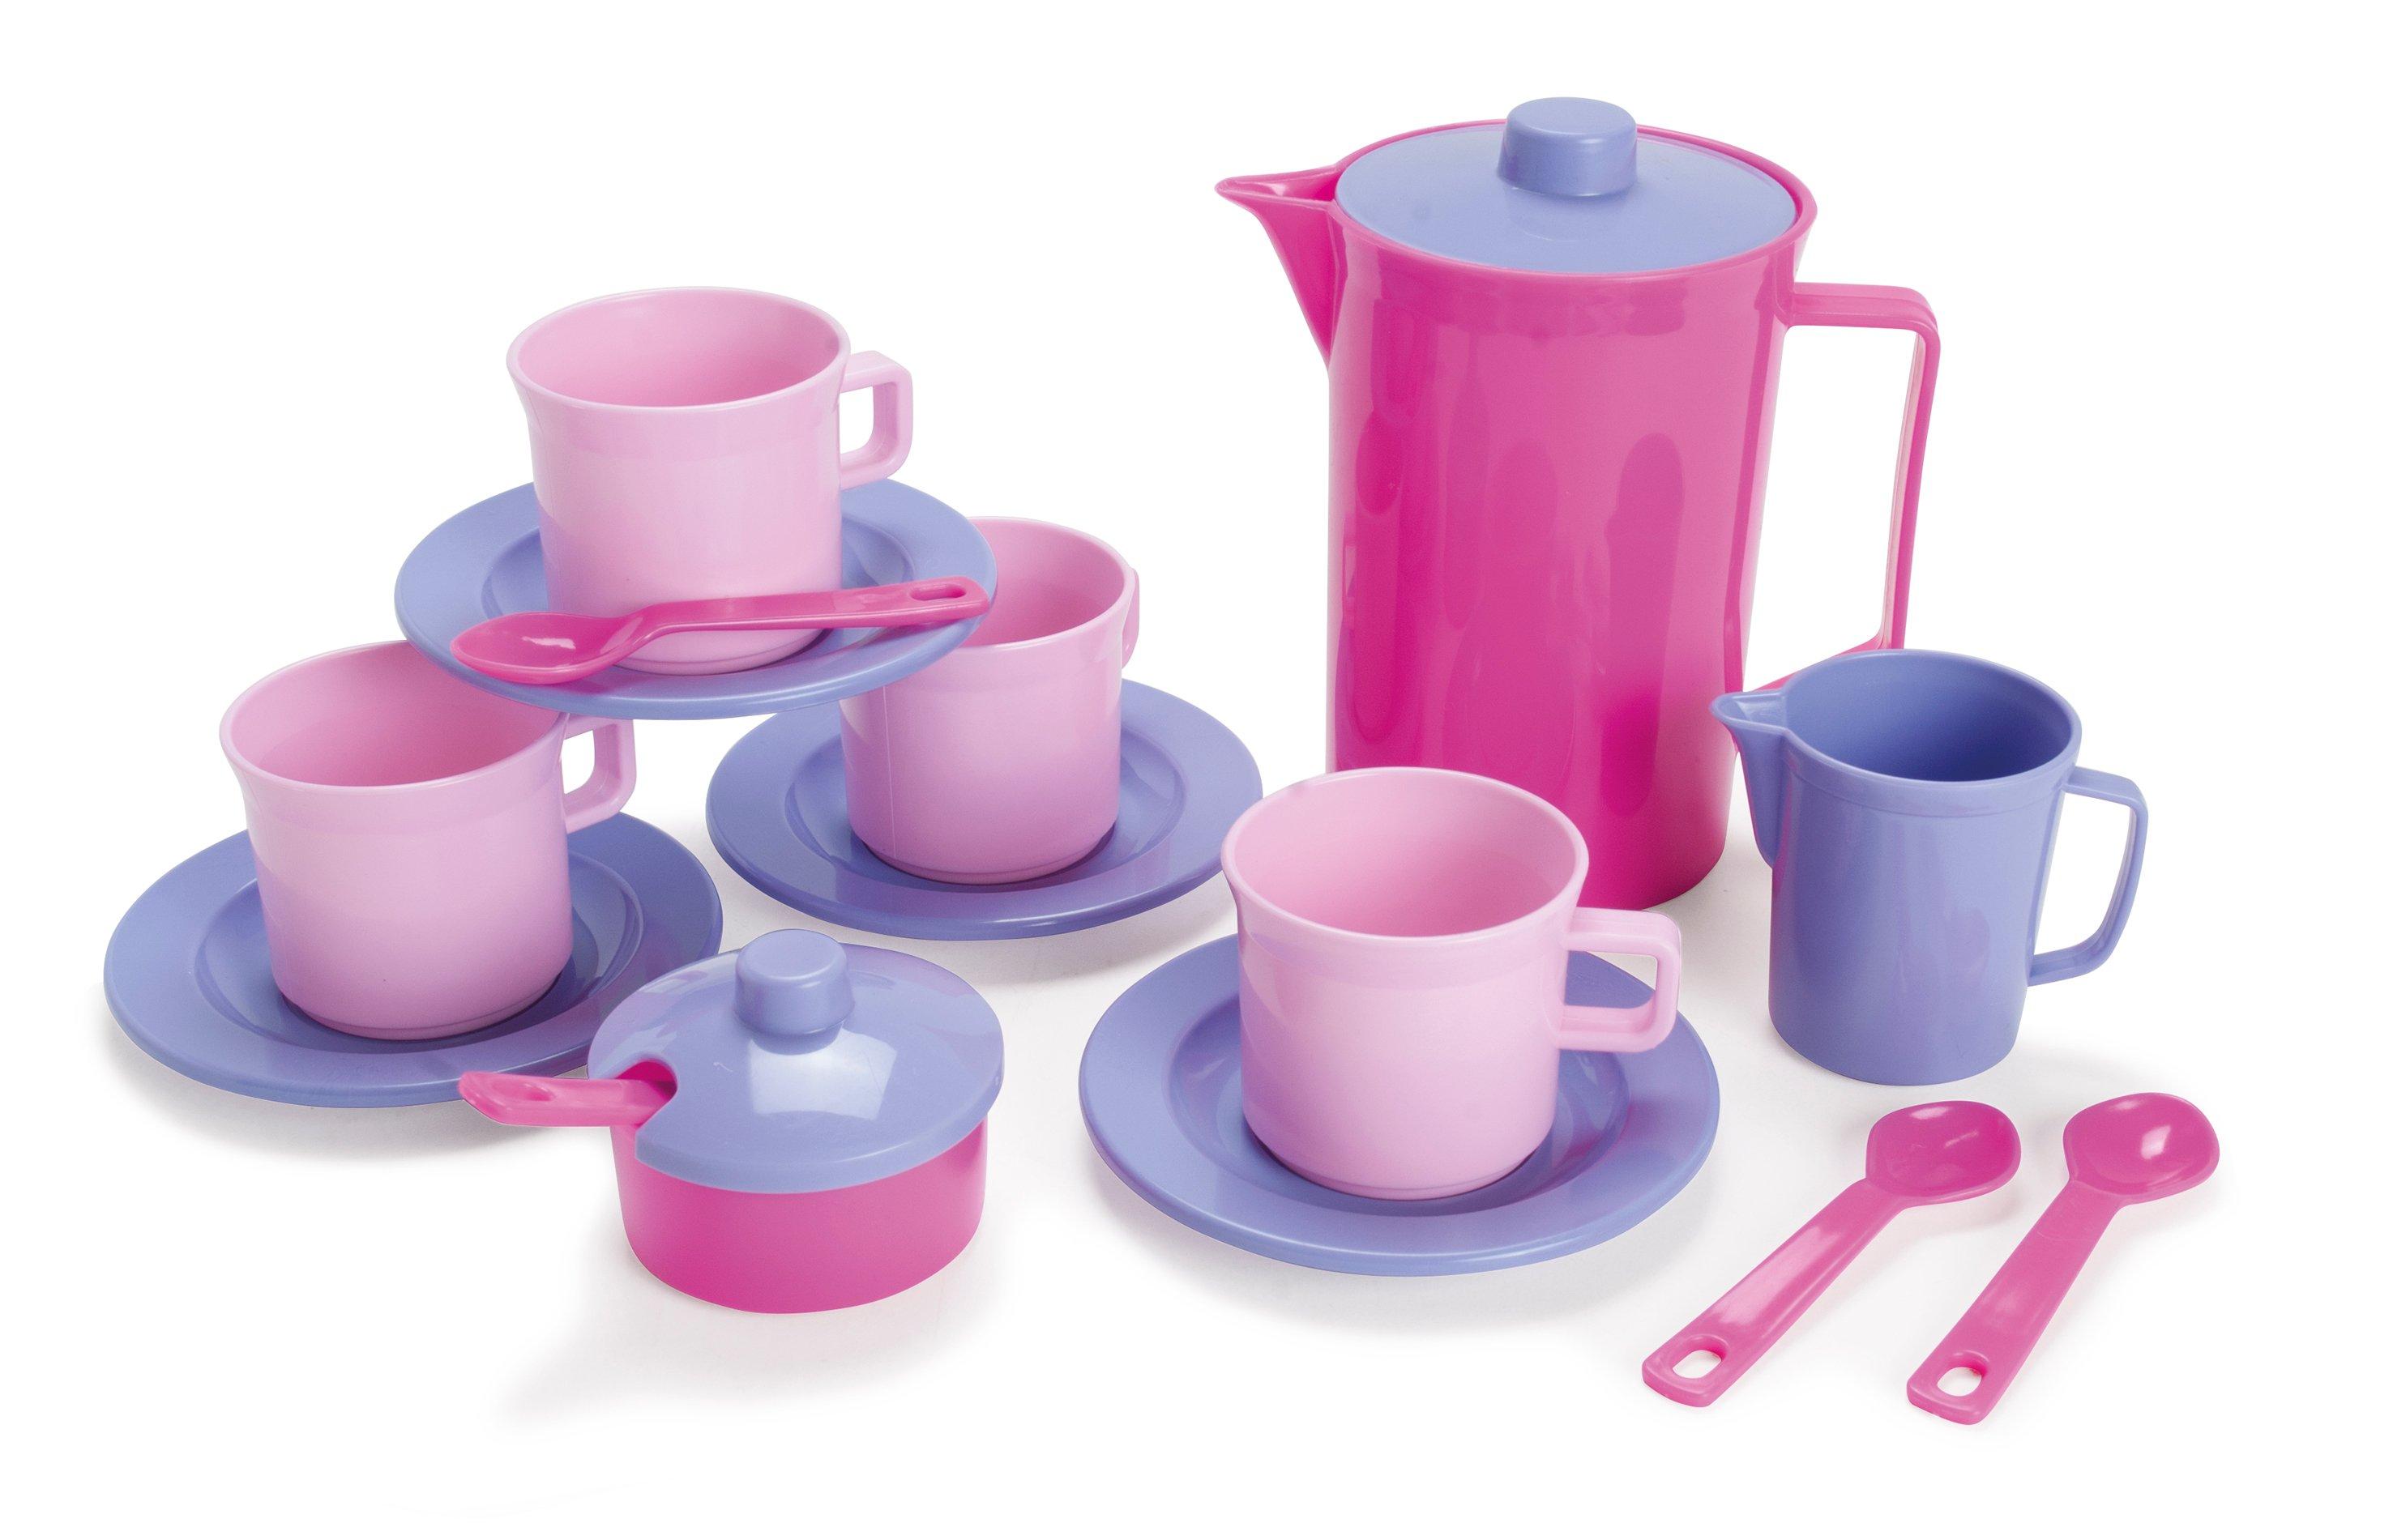 Dantoy - Coffee set, Pink (4396)